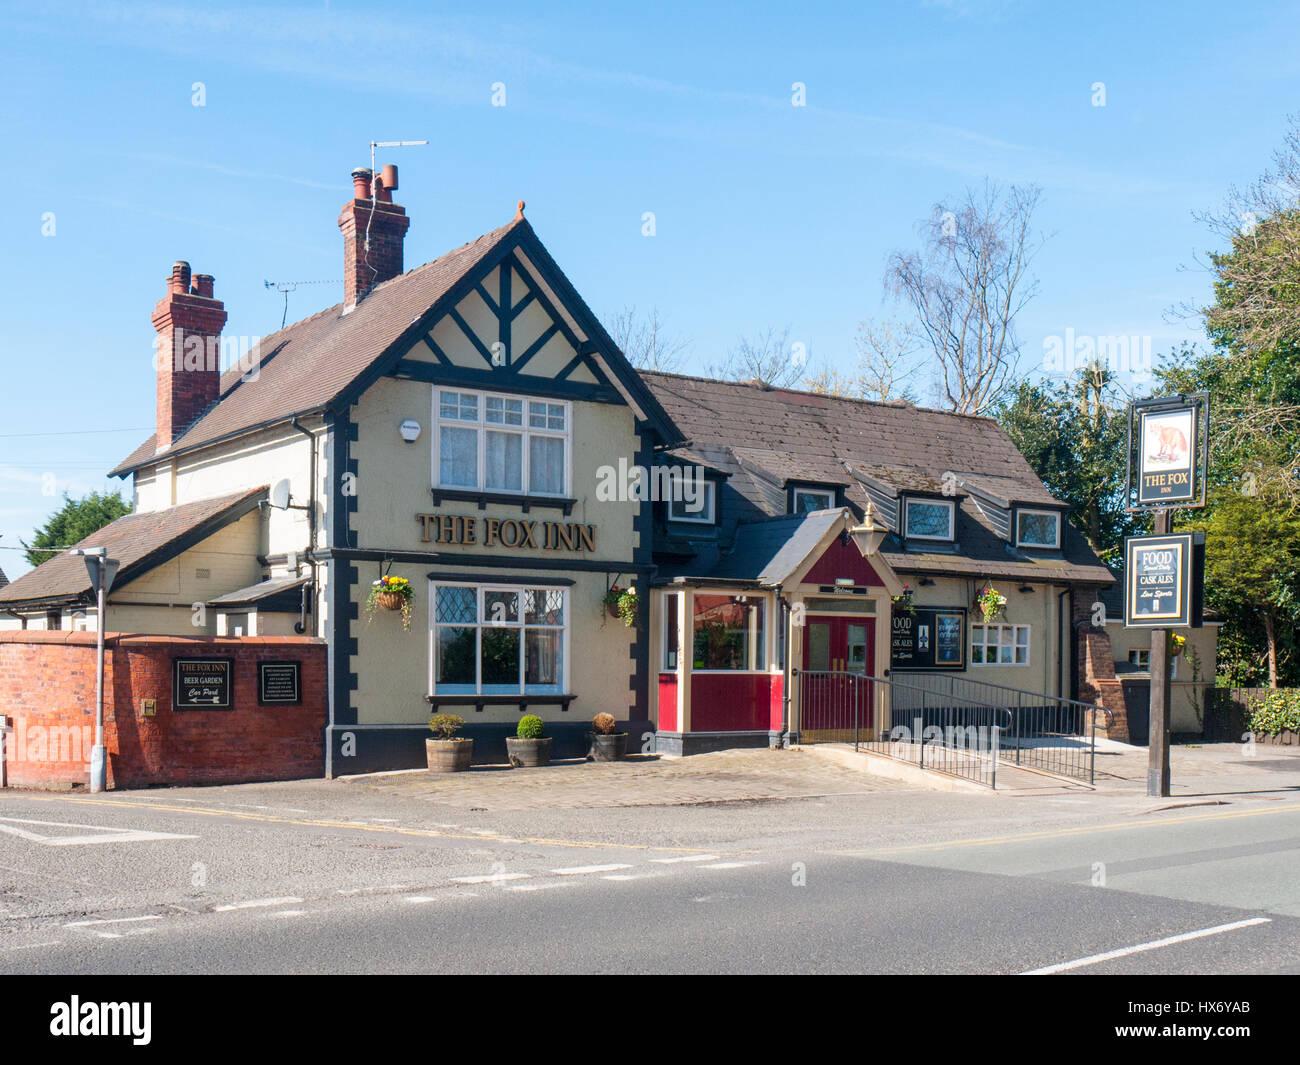 The Fox Inn public house in Elworth Sandbach Cheshire UK - Stock Image